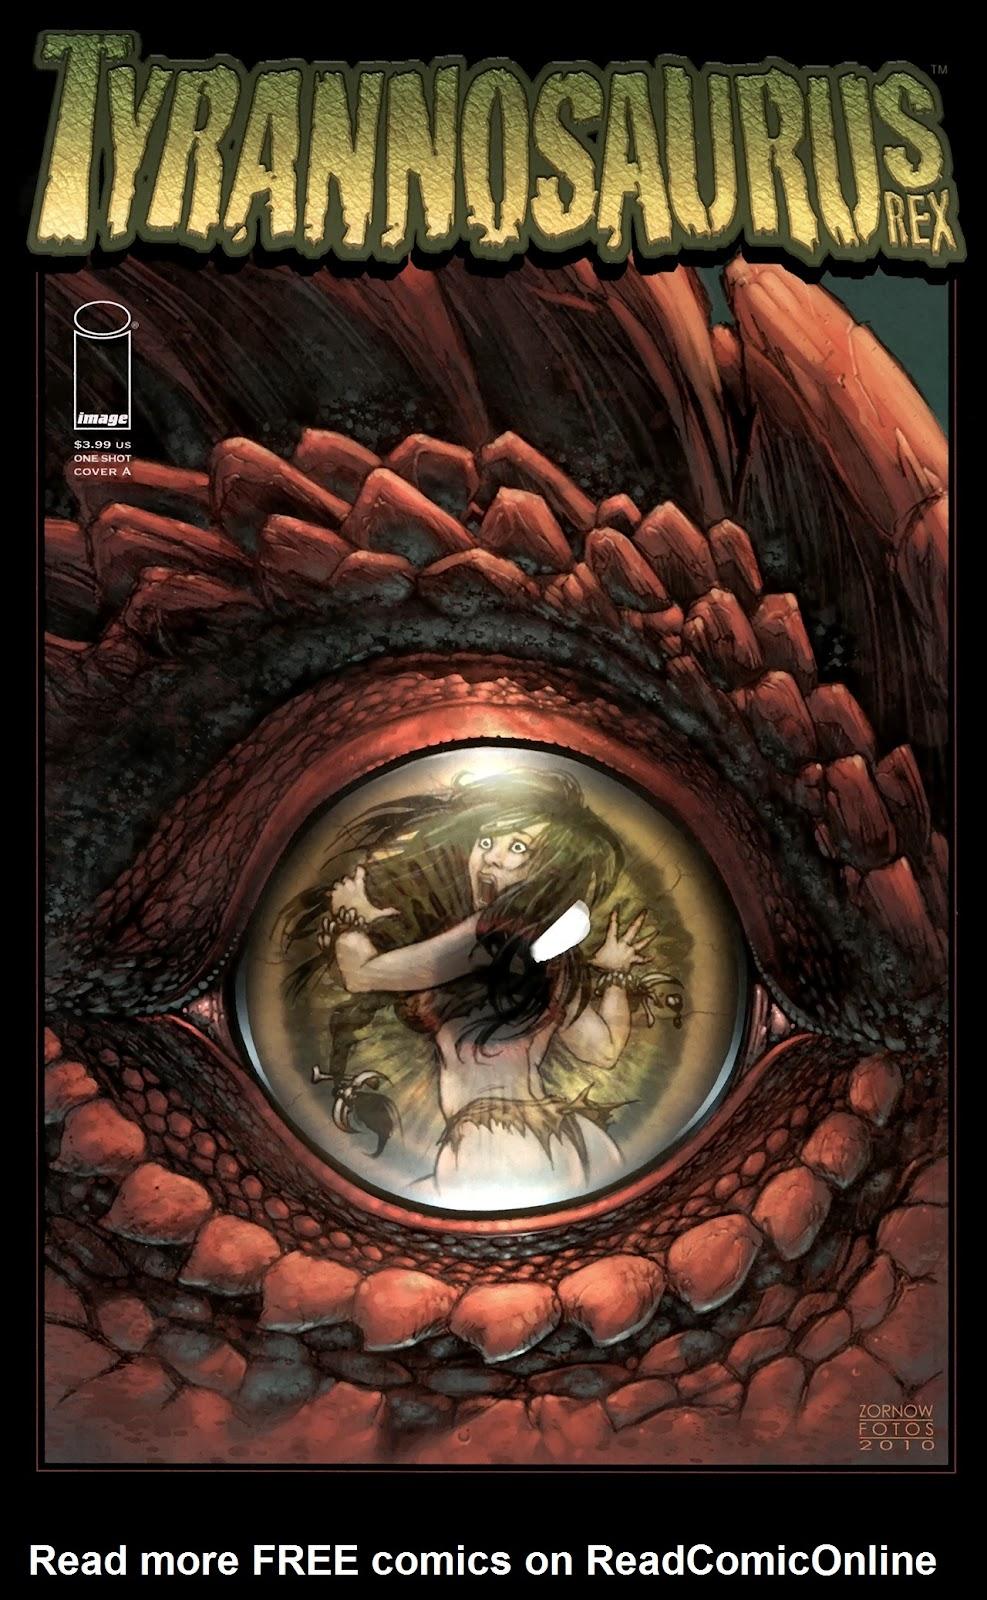 Read online Tyrannosaurus Rex comic -  Issue # Full - 1